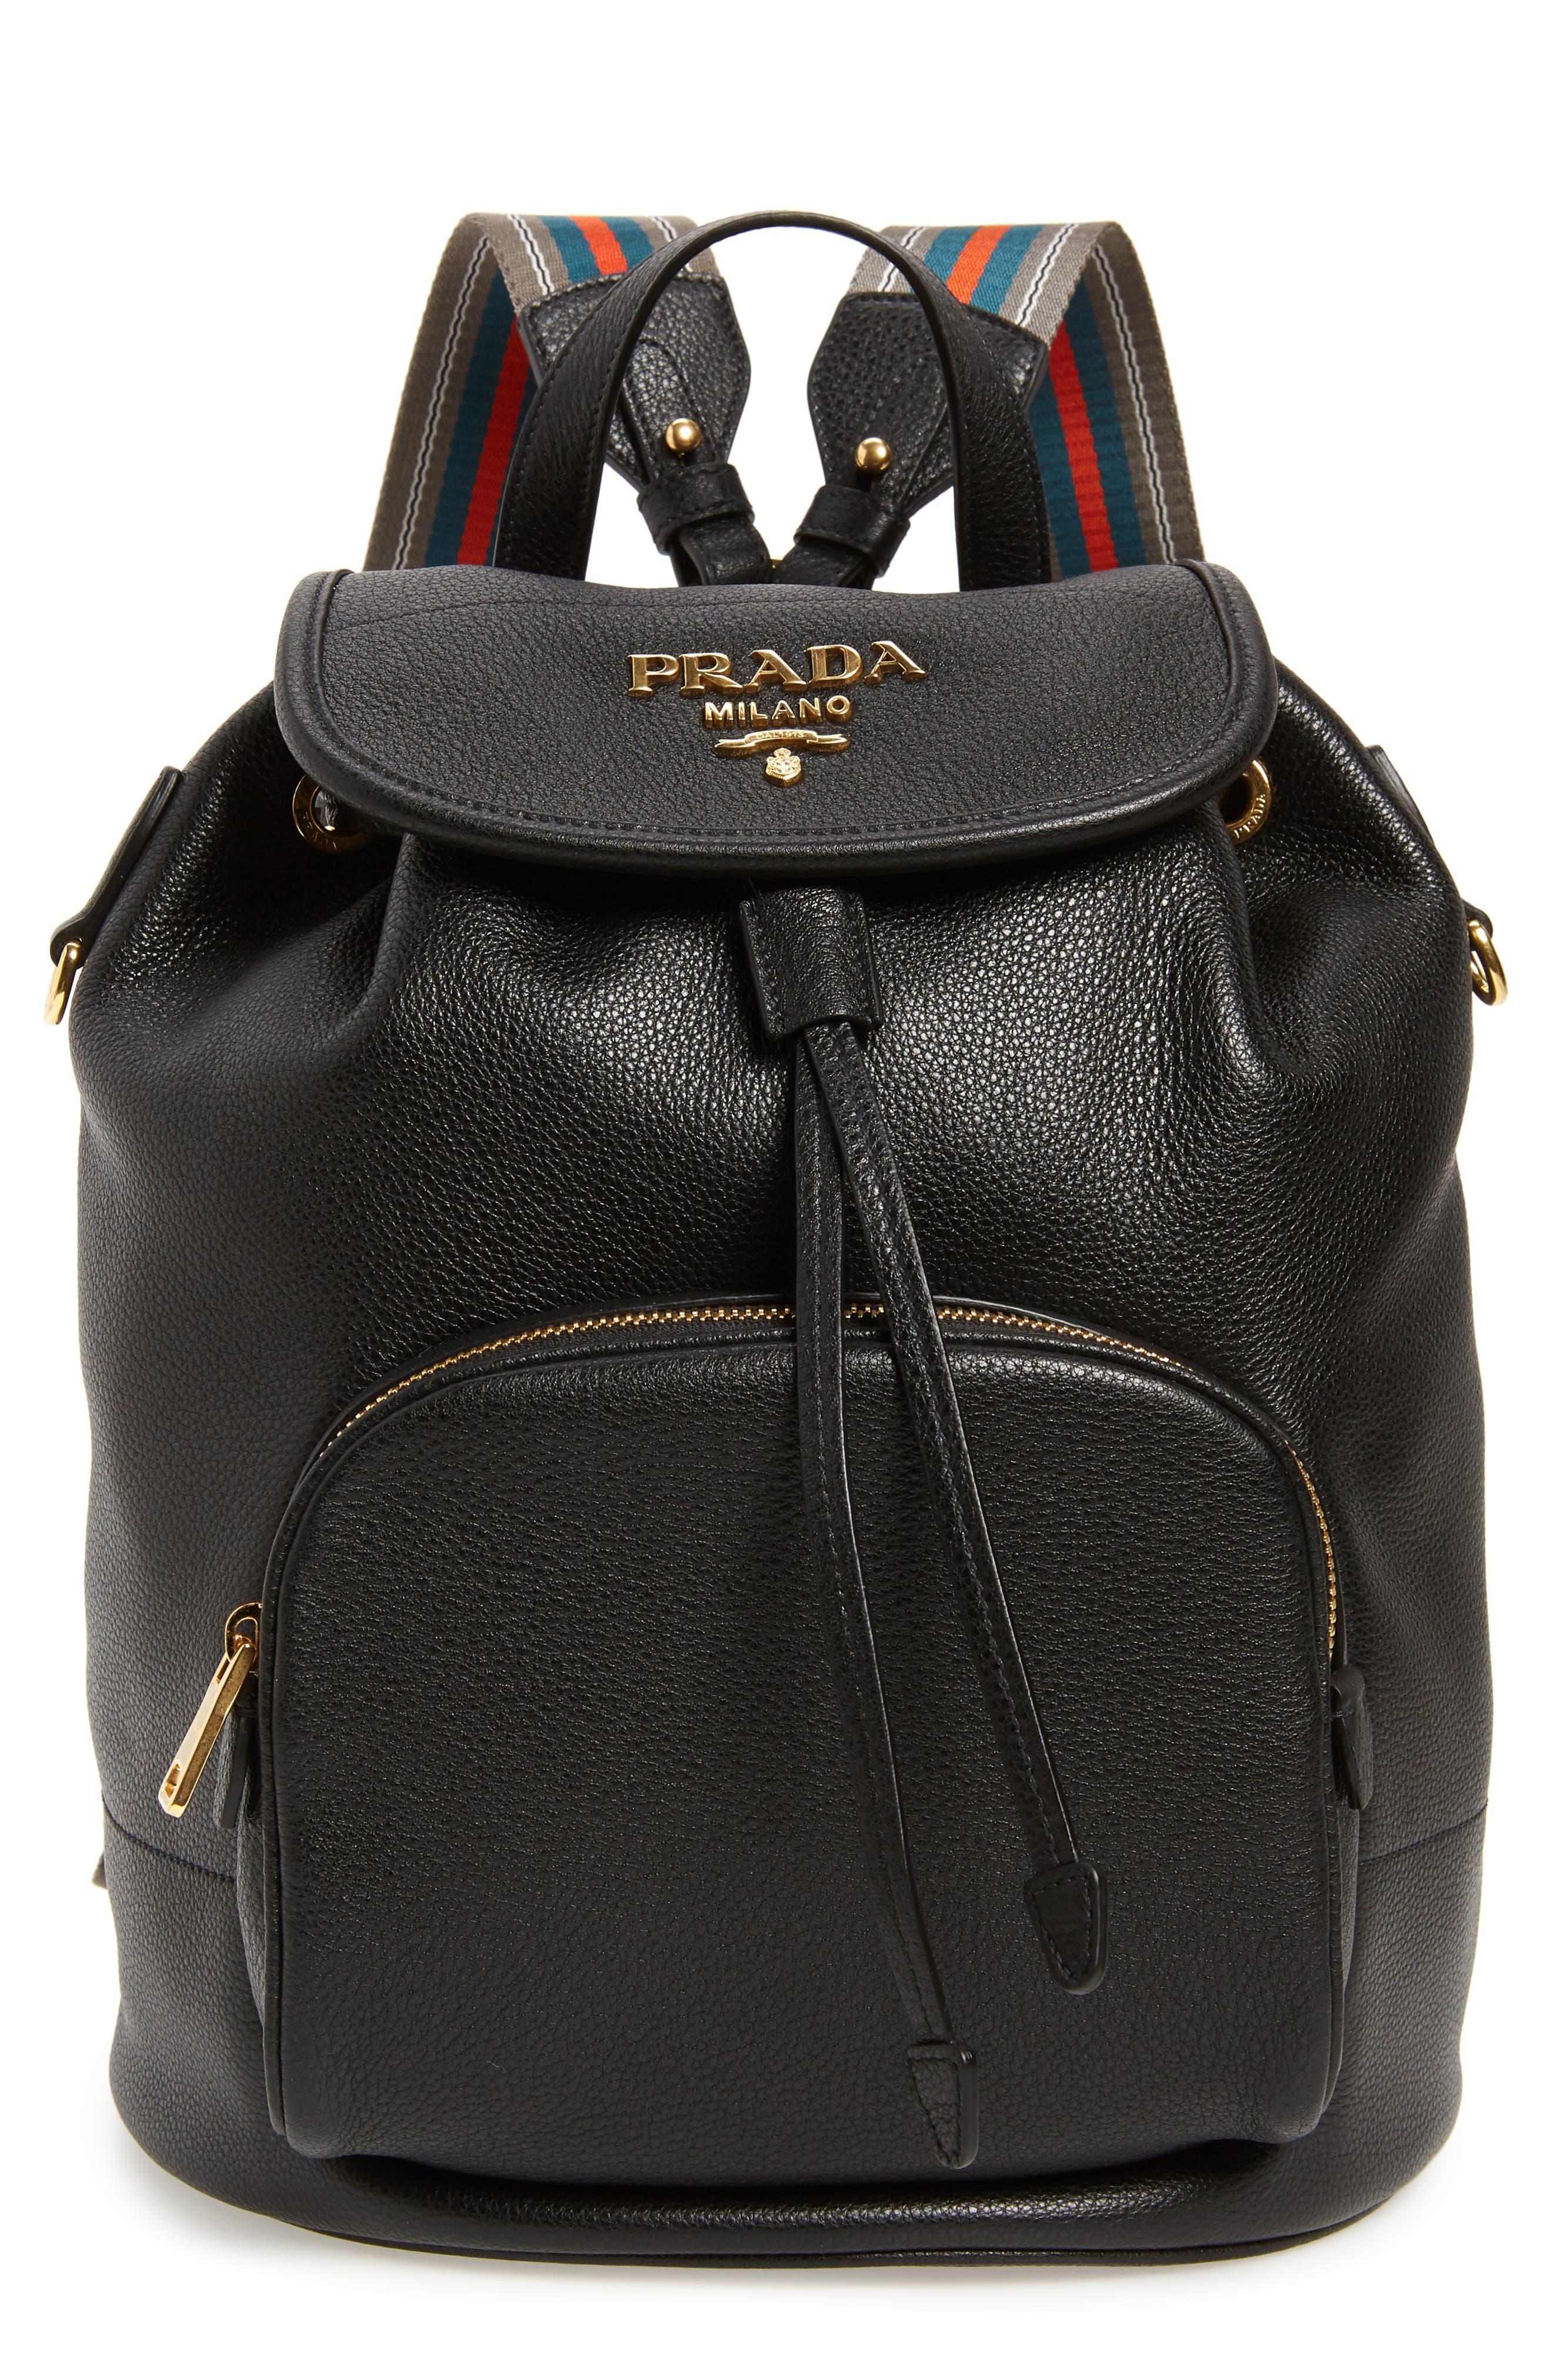 PRADA, Vitello Daino Pebbled Leather Backpack, Main thumbnail 1, color, 001